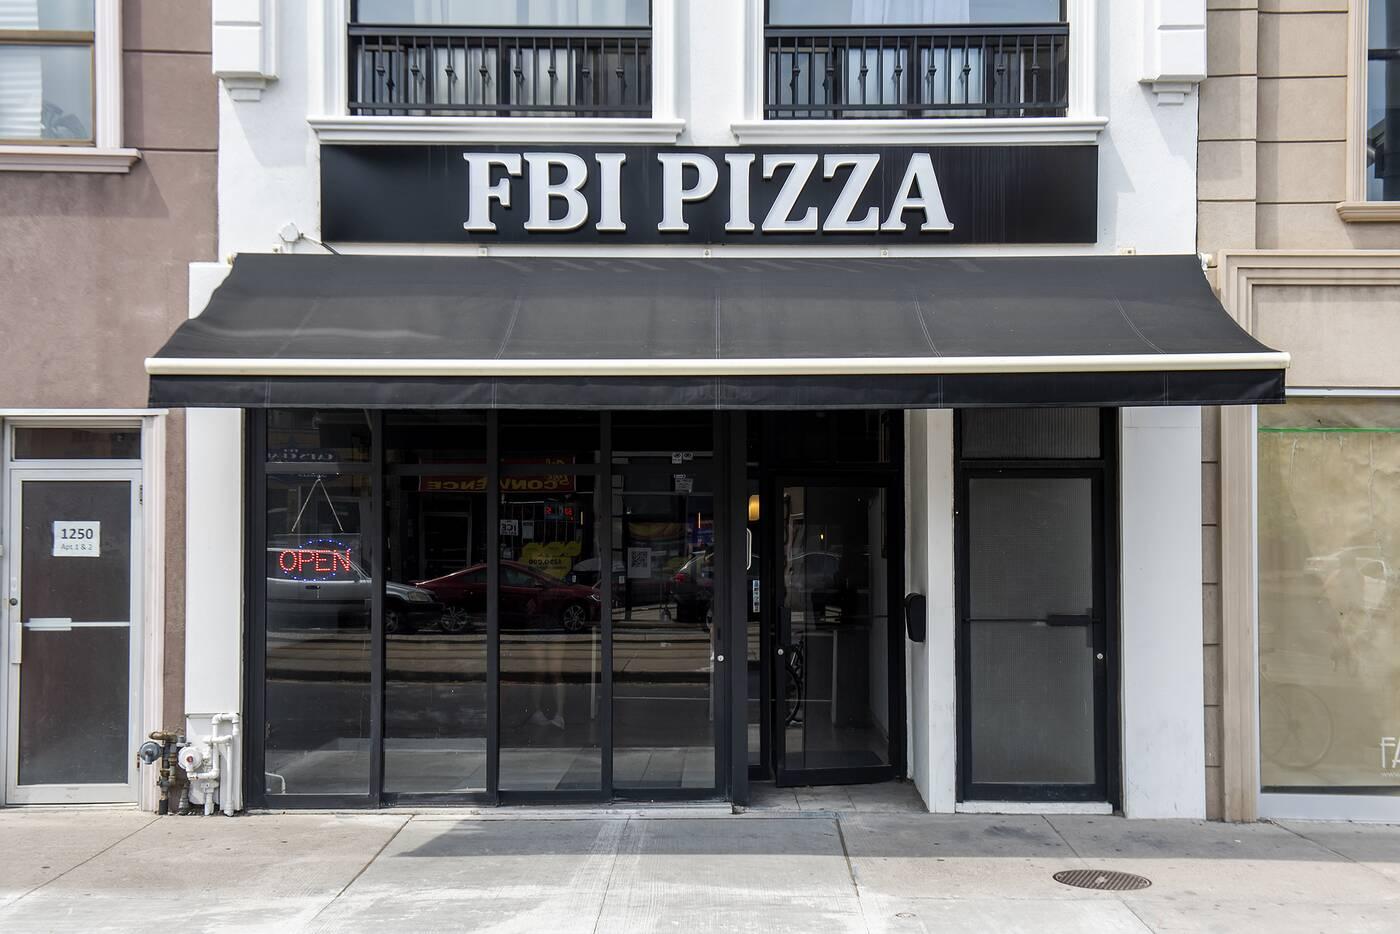 FBI Pizza Toronto